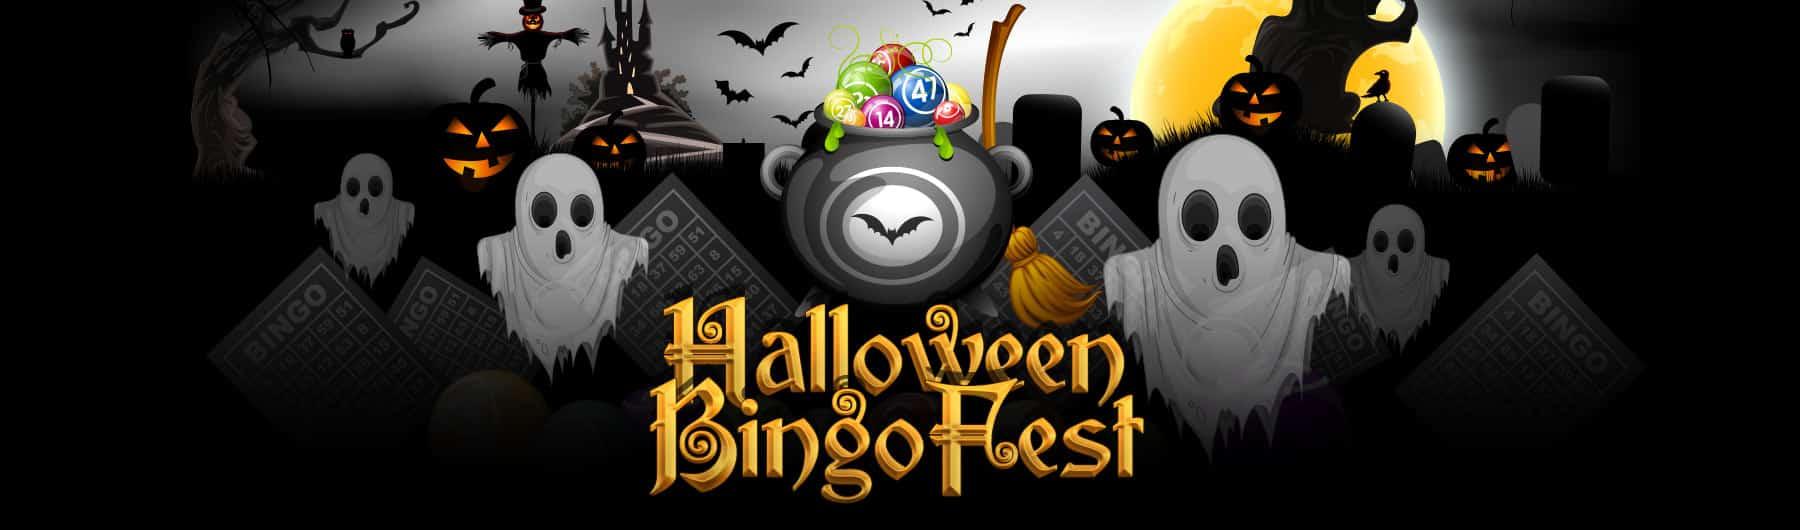 BingoForMoney - Halloween Bingo Feast